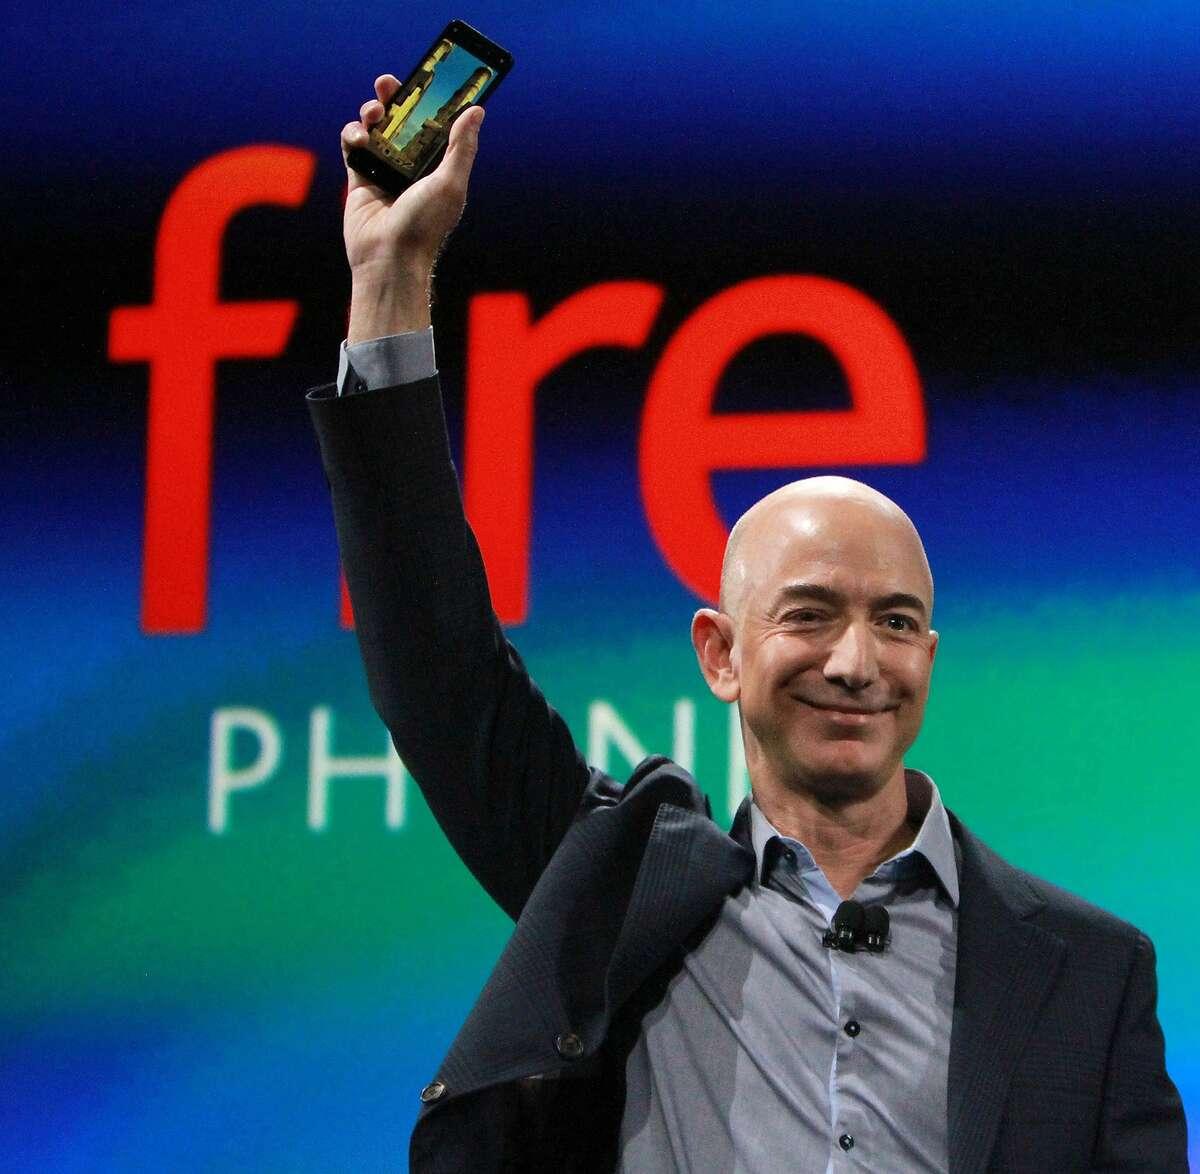 #1 Jeff Bezos & family Amazon founder Net worth: $131 B